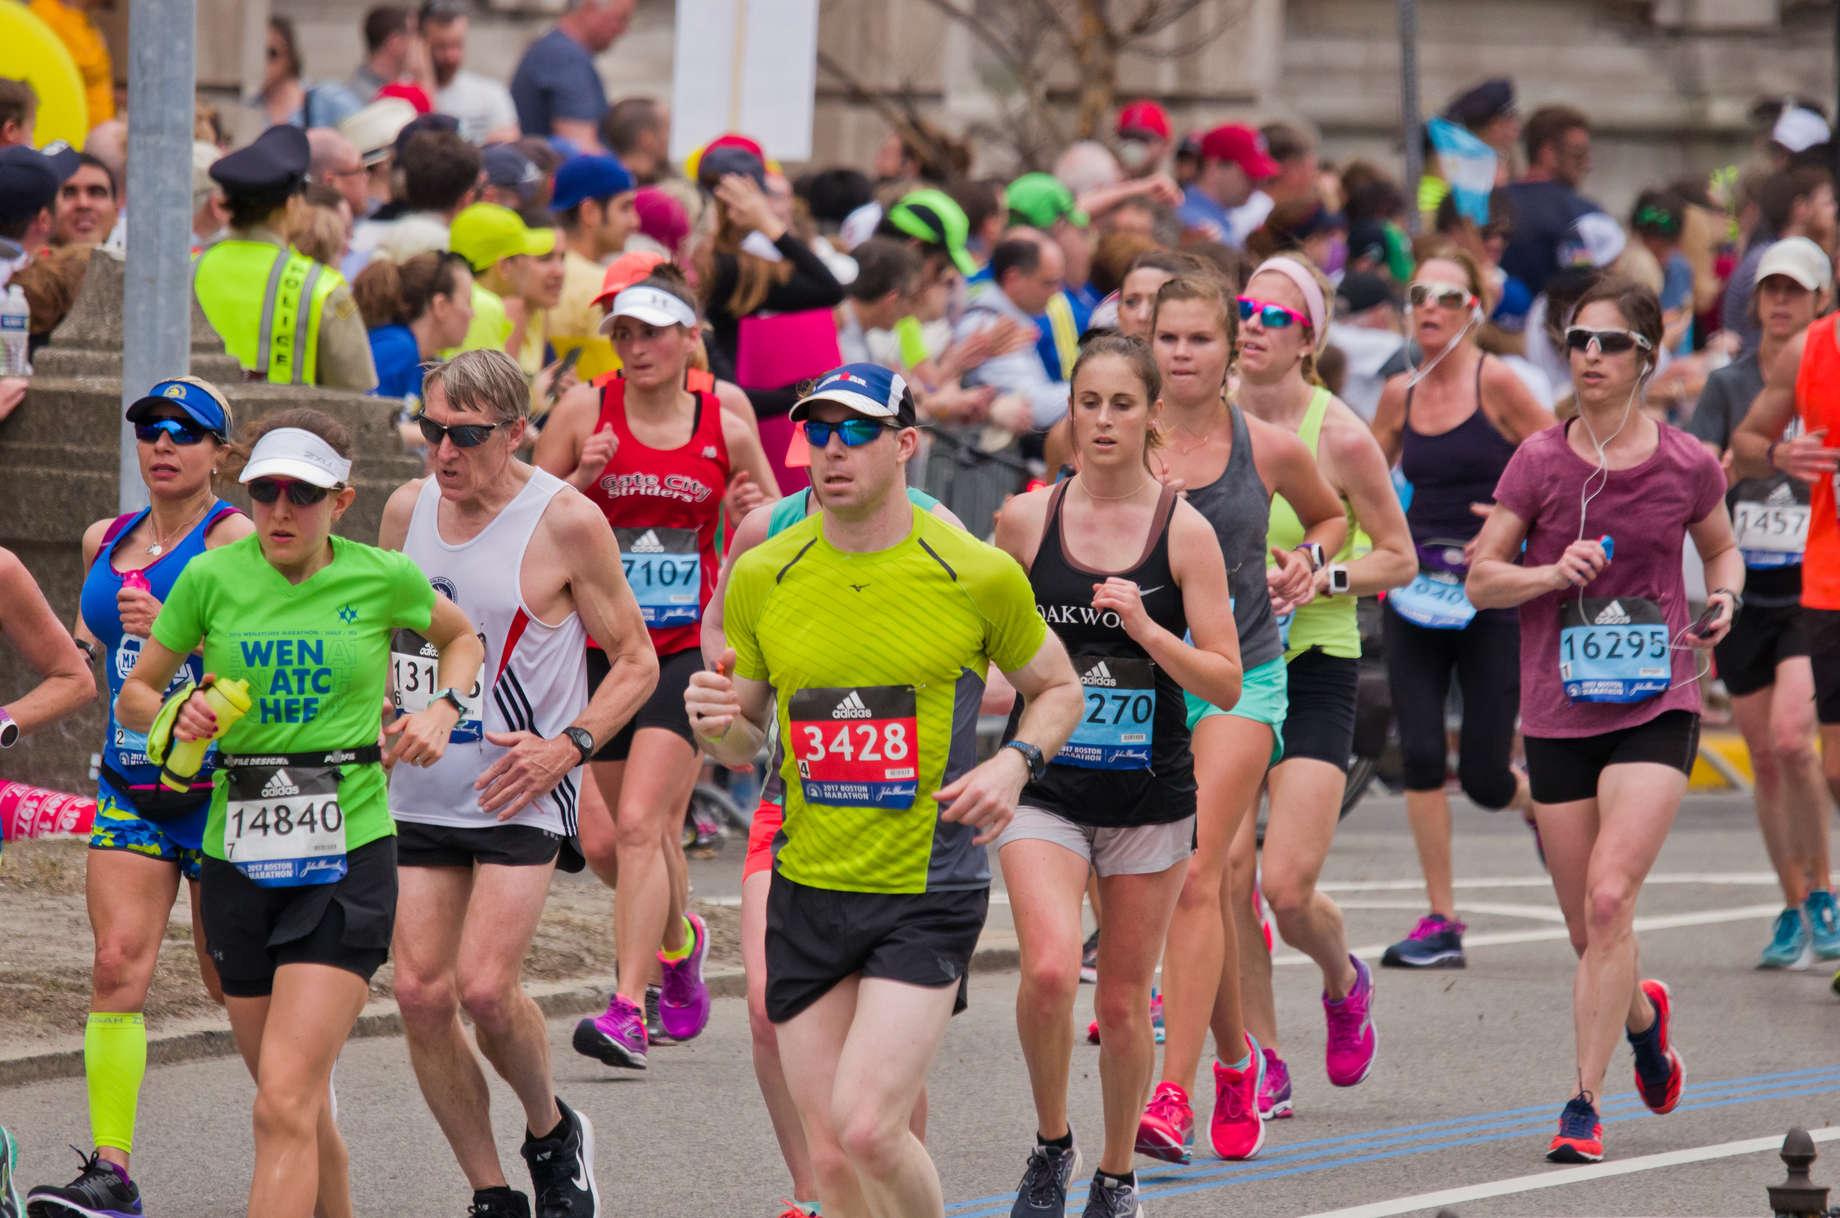 Alison Donnini Half Marathon Sponsor